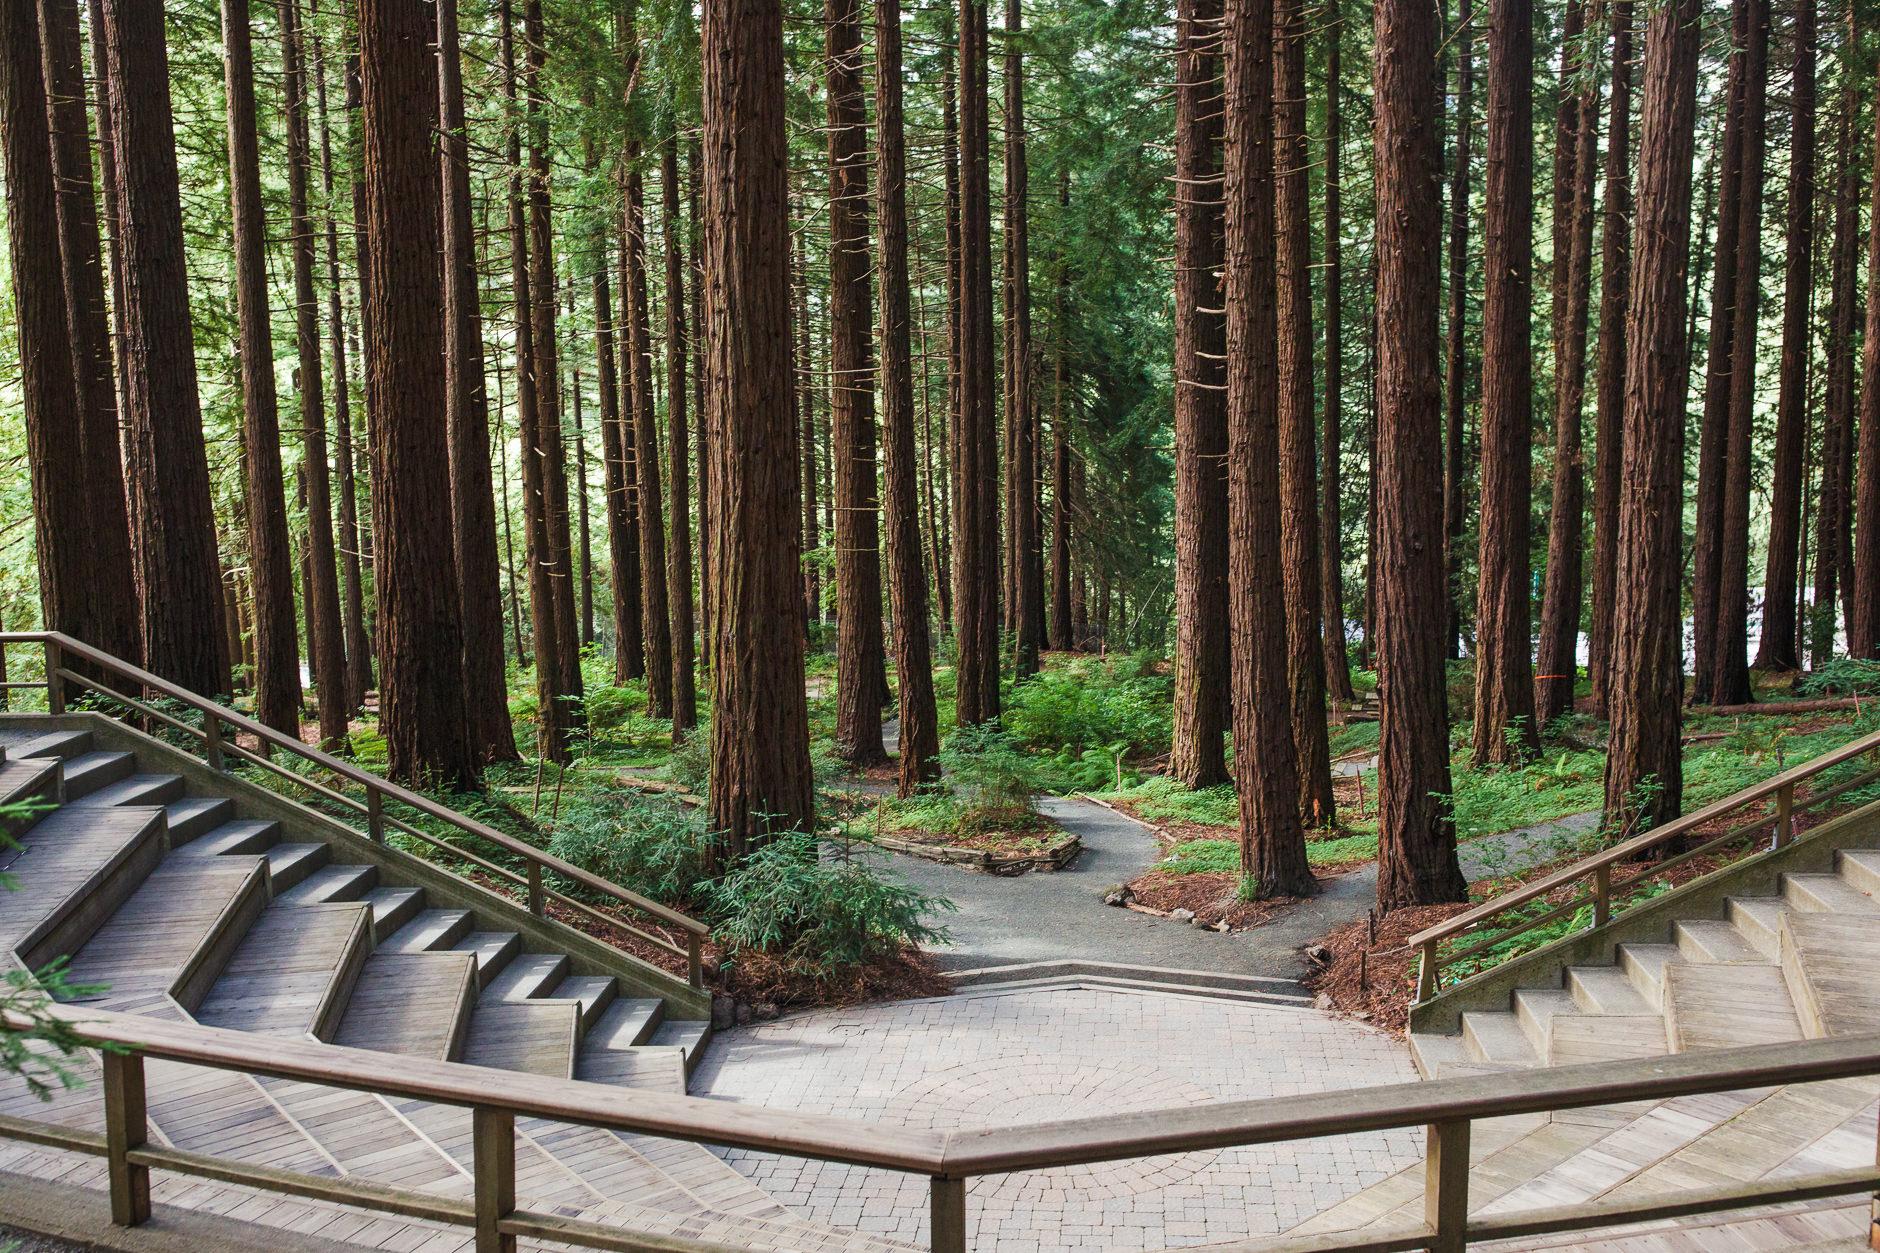 Berkeley Botanical Gardens (Redwood Amphitheatre) - Price Average: $2,200- $3,000Max Capacity: 200Mood: serene, humble, harmonious Location: Berkeley, CA